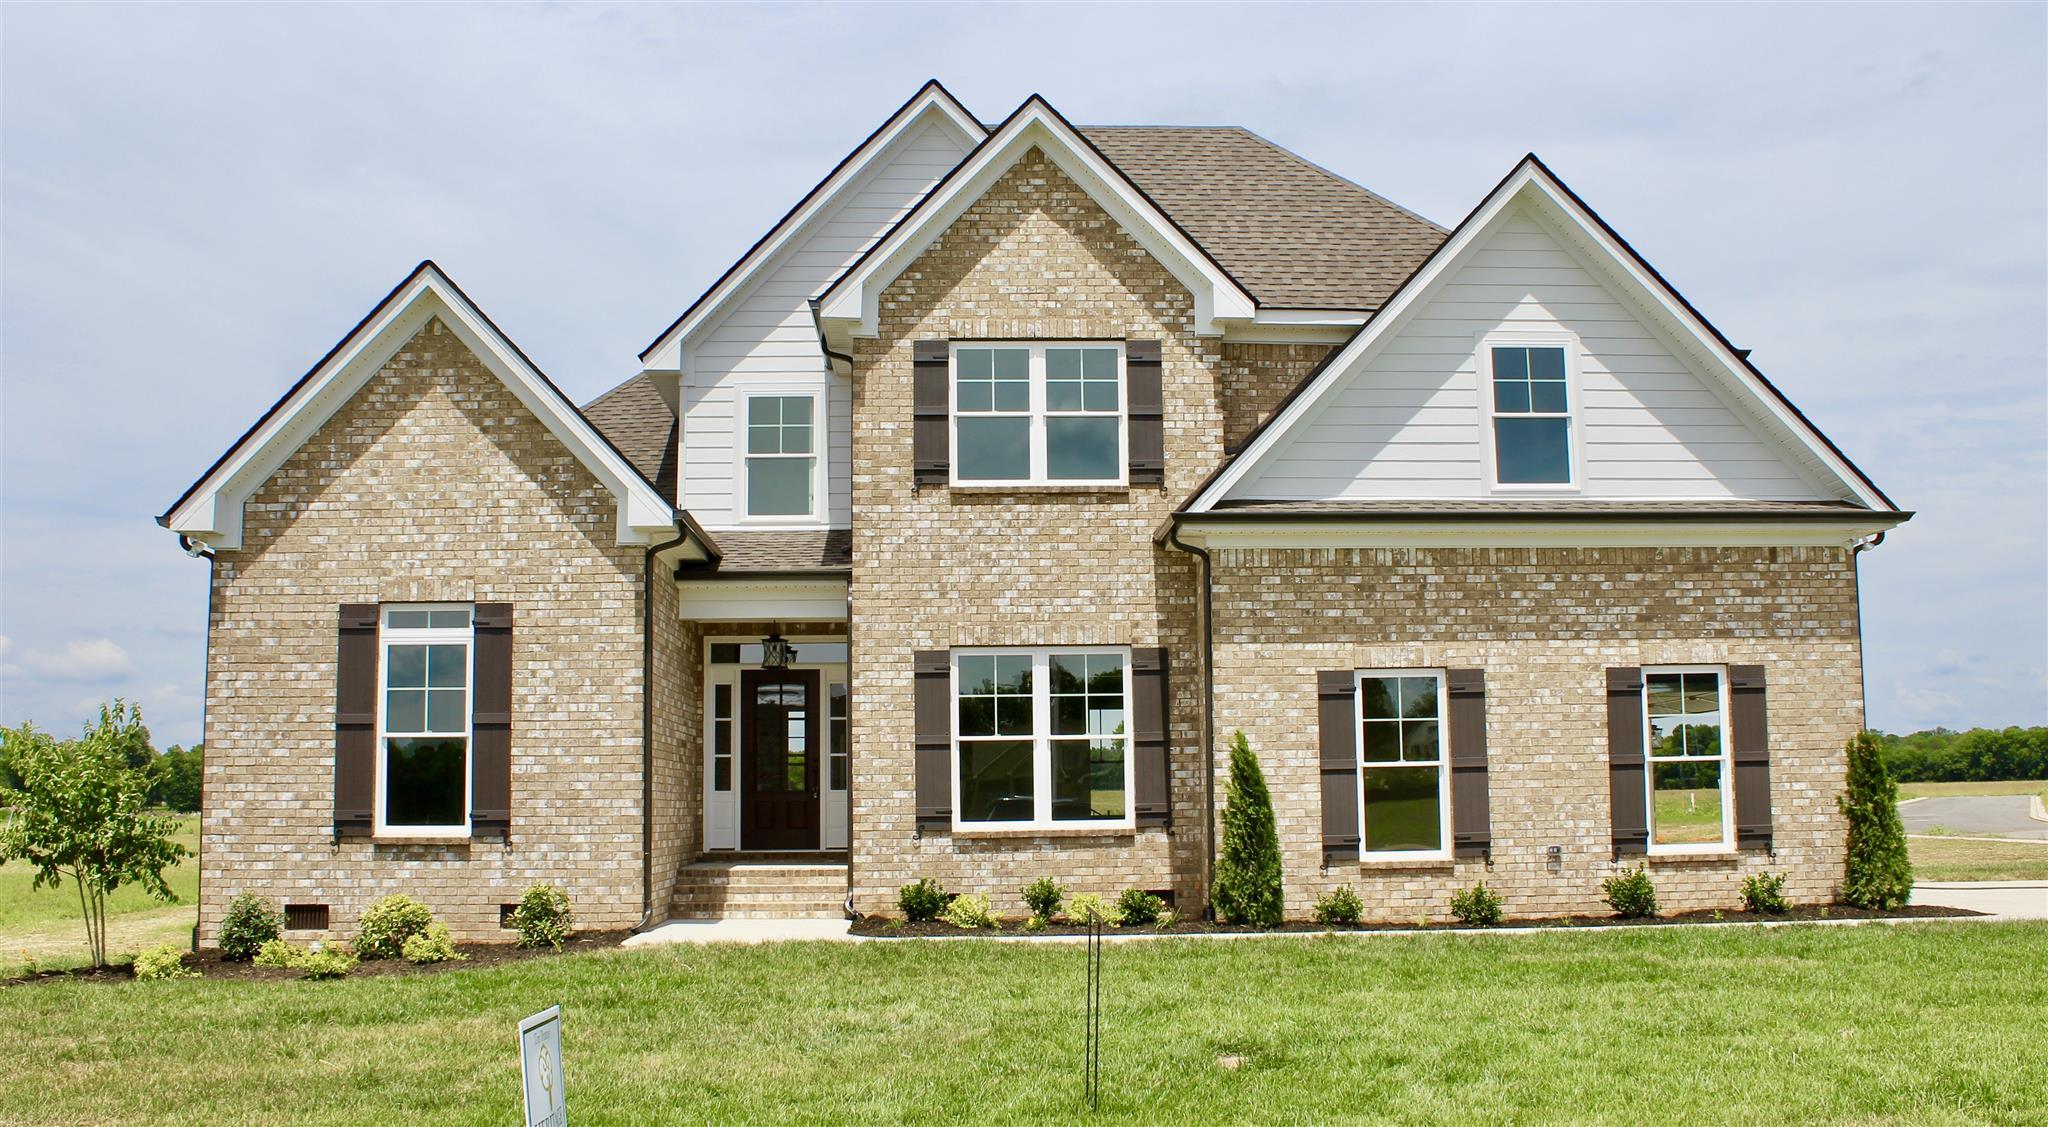 Photo of 3917 Merryman Lane Lot 90  Murfreesboro  TN